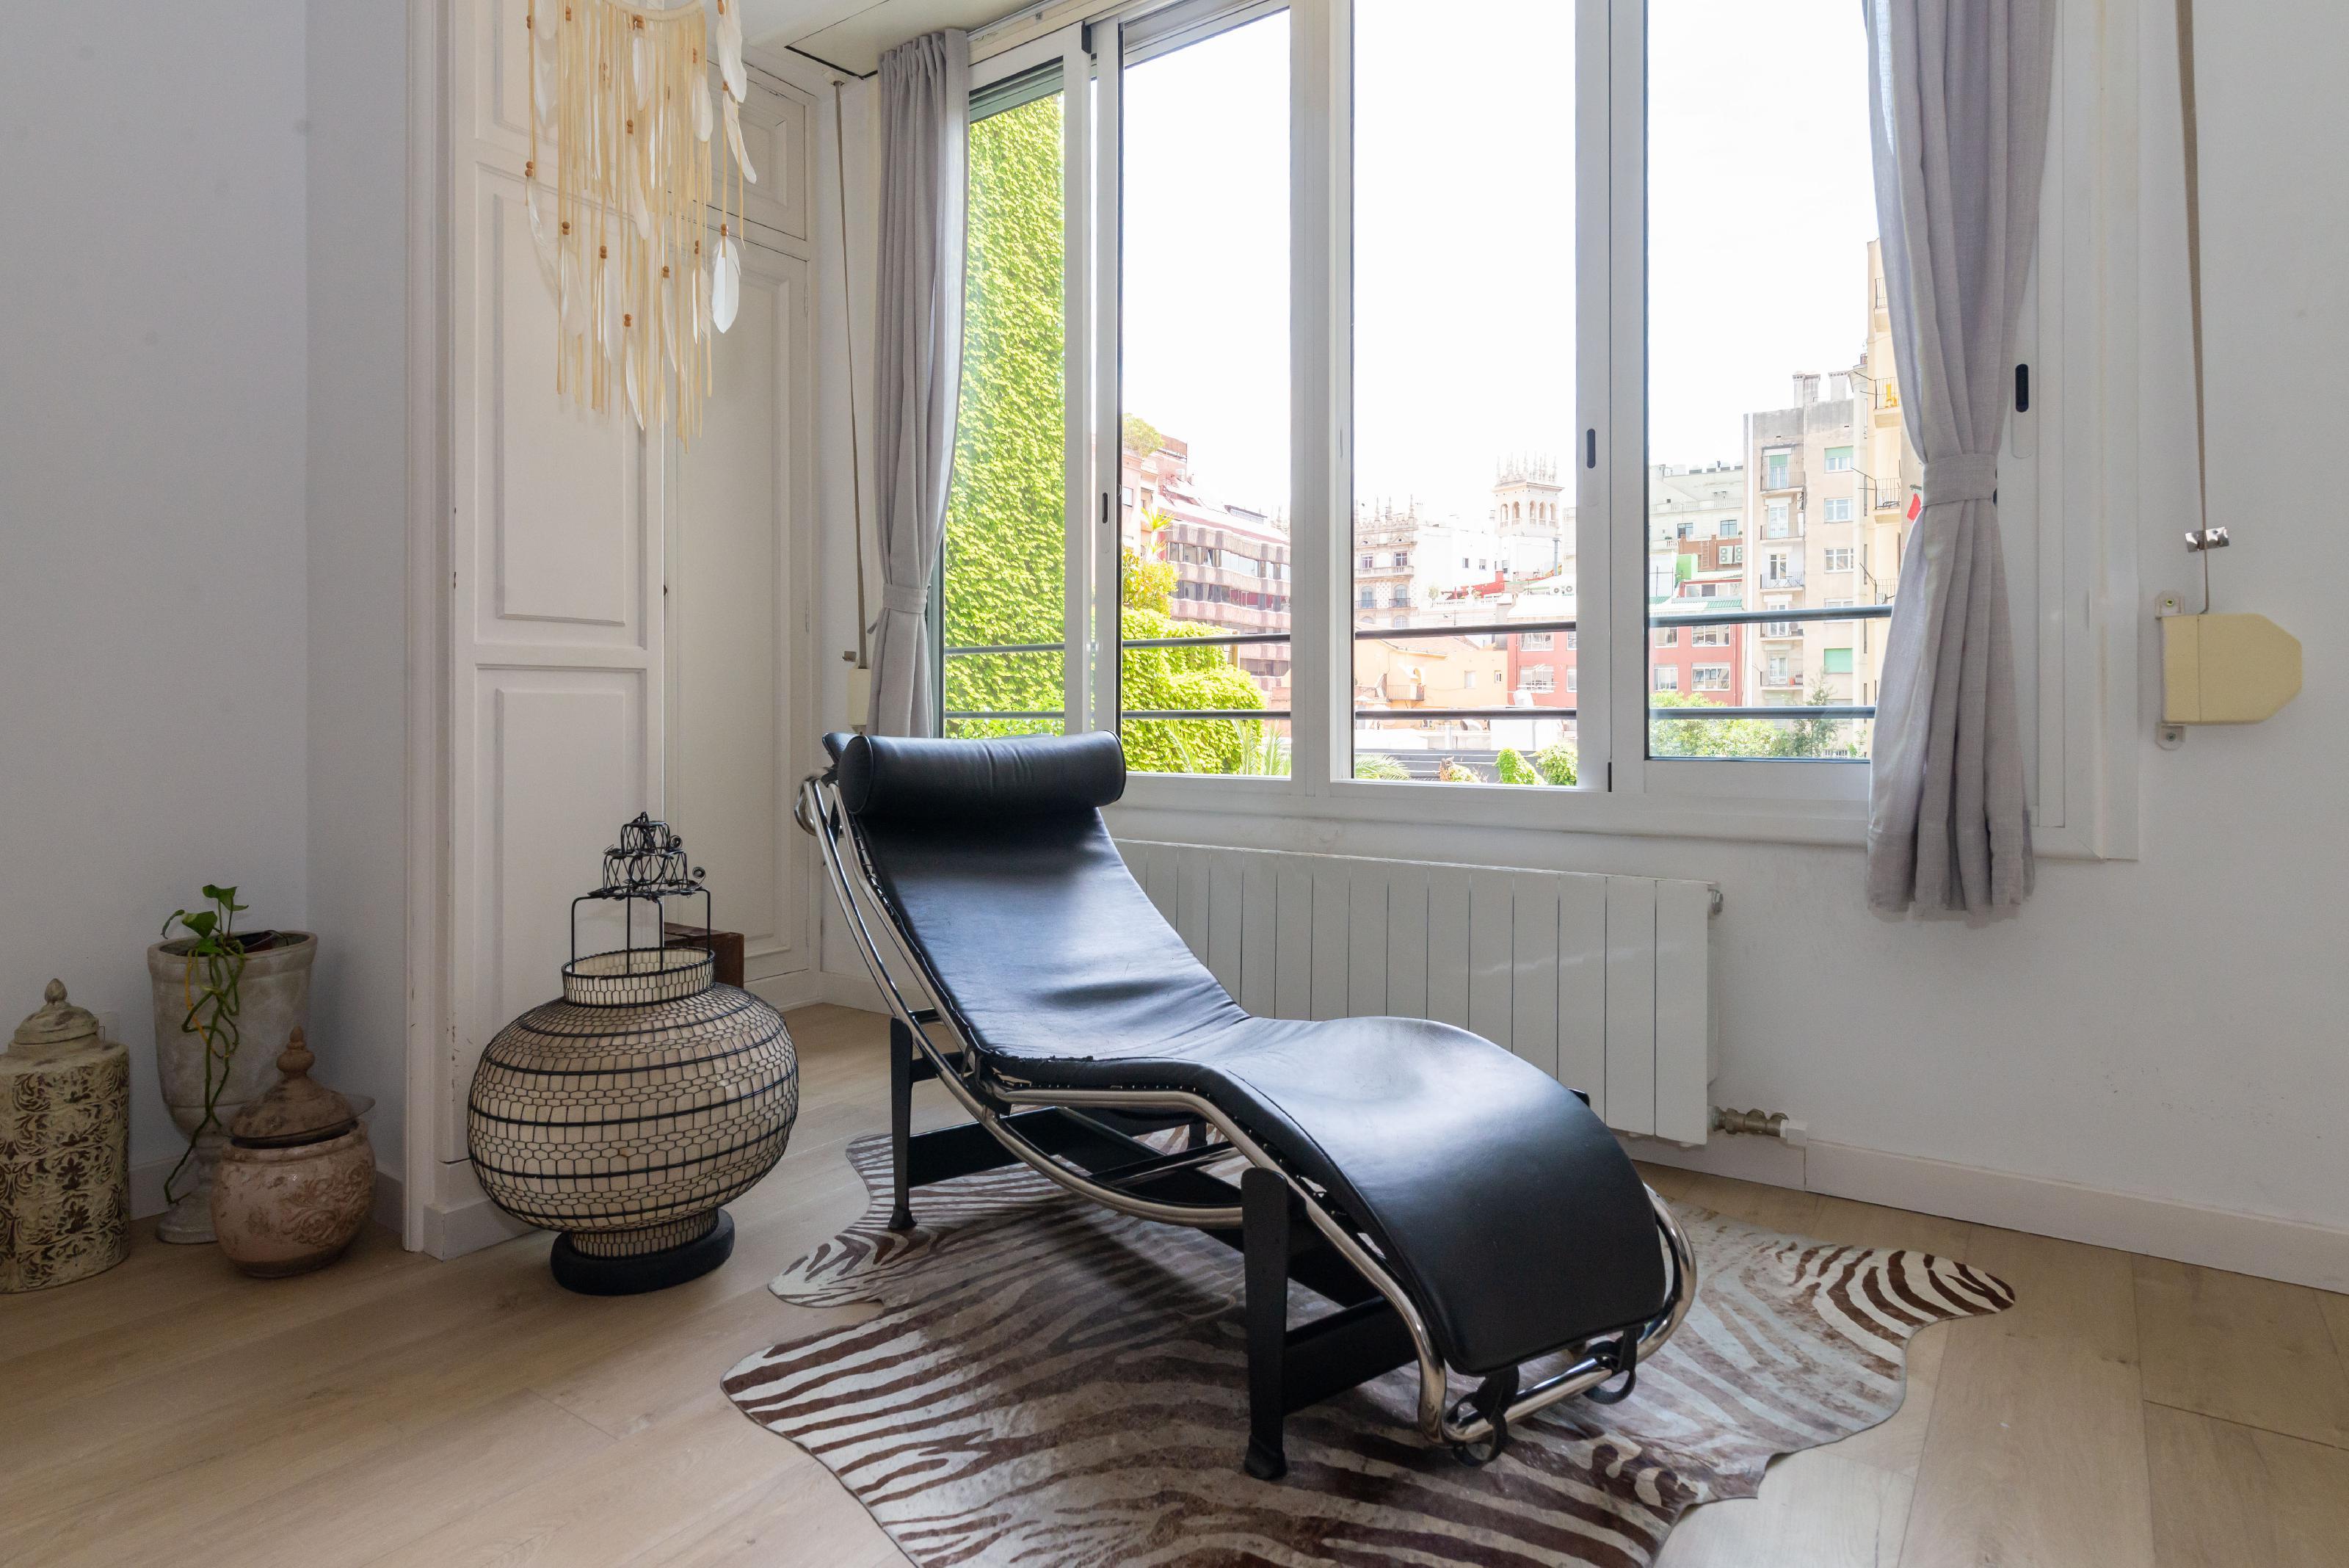 250005 Flat for sale in Sarrià-Sant Gervasi, Sant Gervasi-Galvany 8